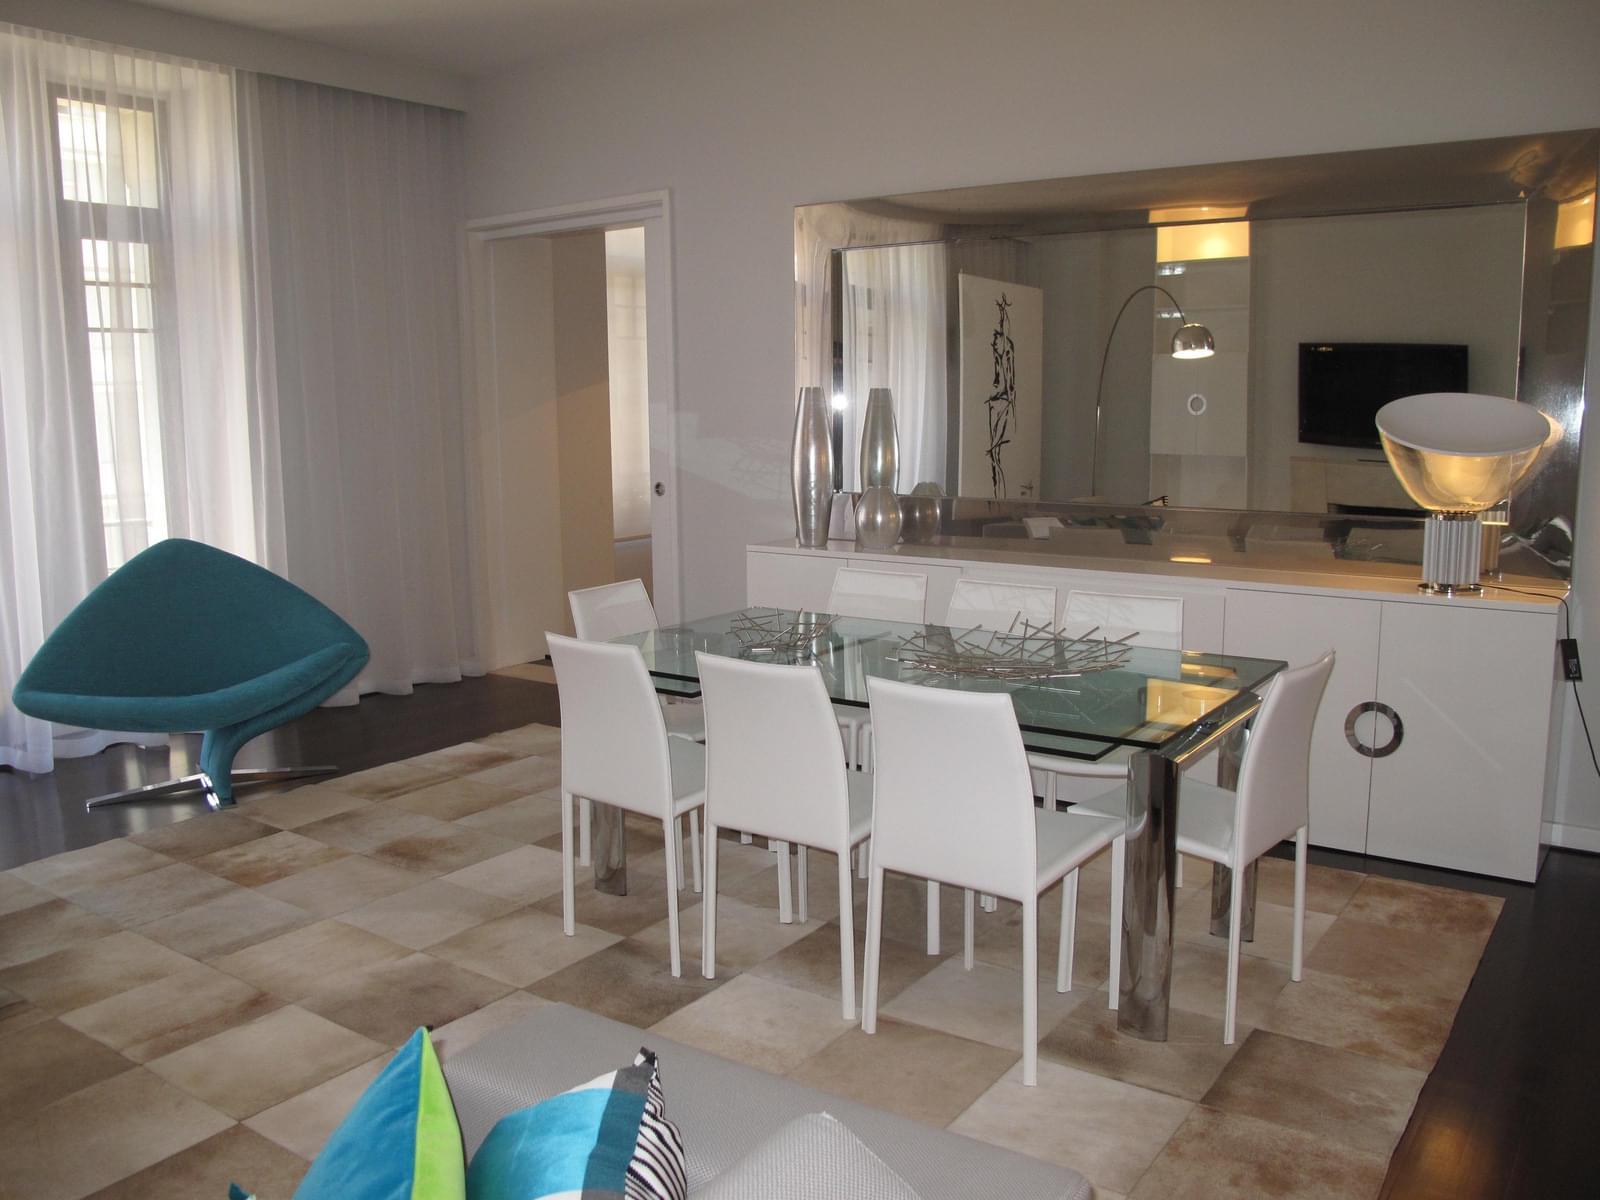 pf18338-apartamento-t2-lisboa-b818eb3d-004a-4c95-9a30-e4e1f5f74216